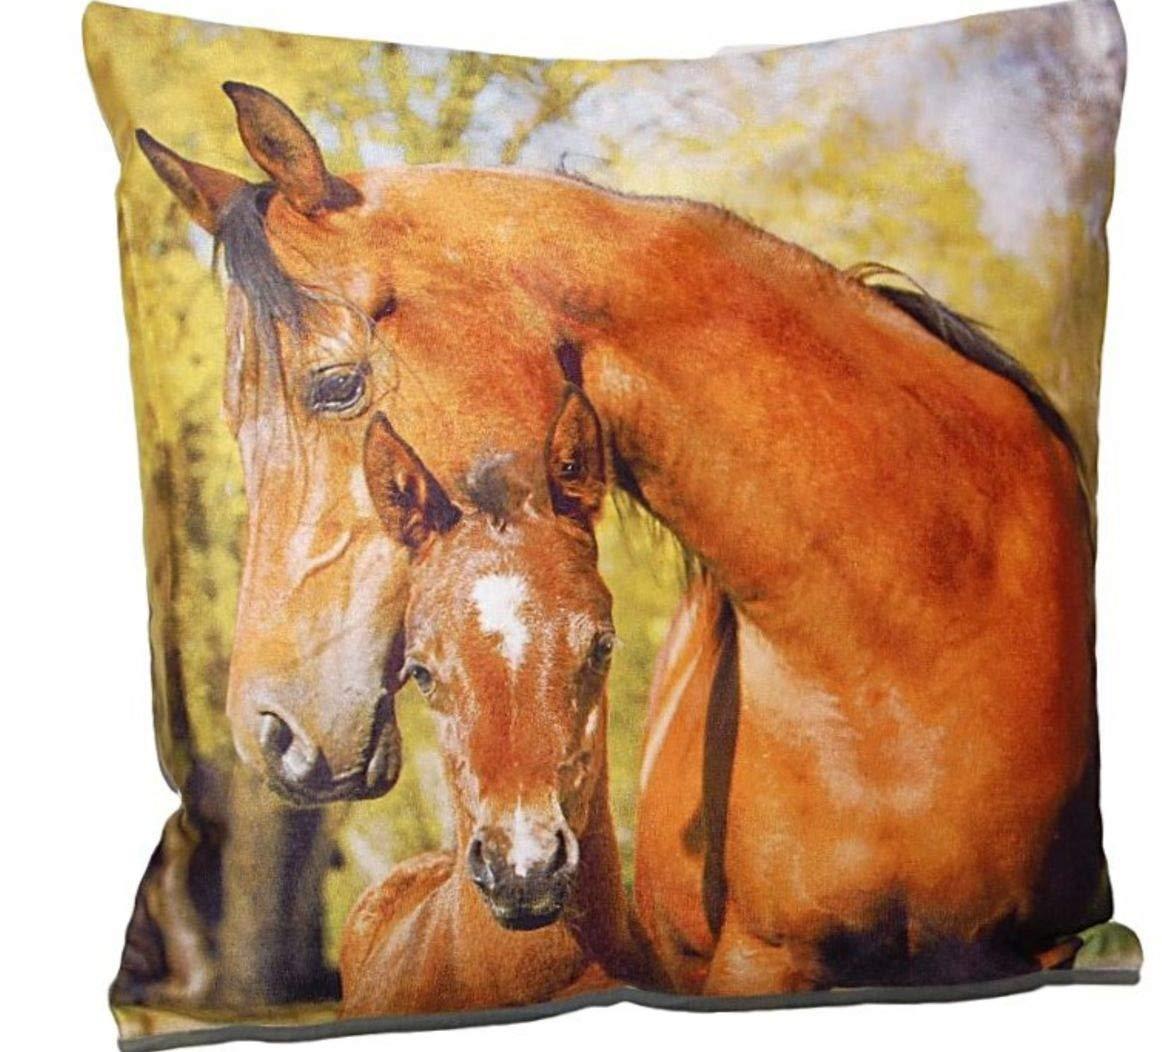 #1 CAOLATOR Baumwolle Leinen Kissenbez/üge Kreatives Laufendes Pferd Form Kissen Fall Einfach Tiere Thema Stil Sofa Kaffee Room Dekorative Kissenh/ülle 45 45cm